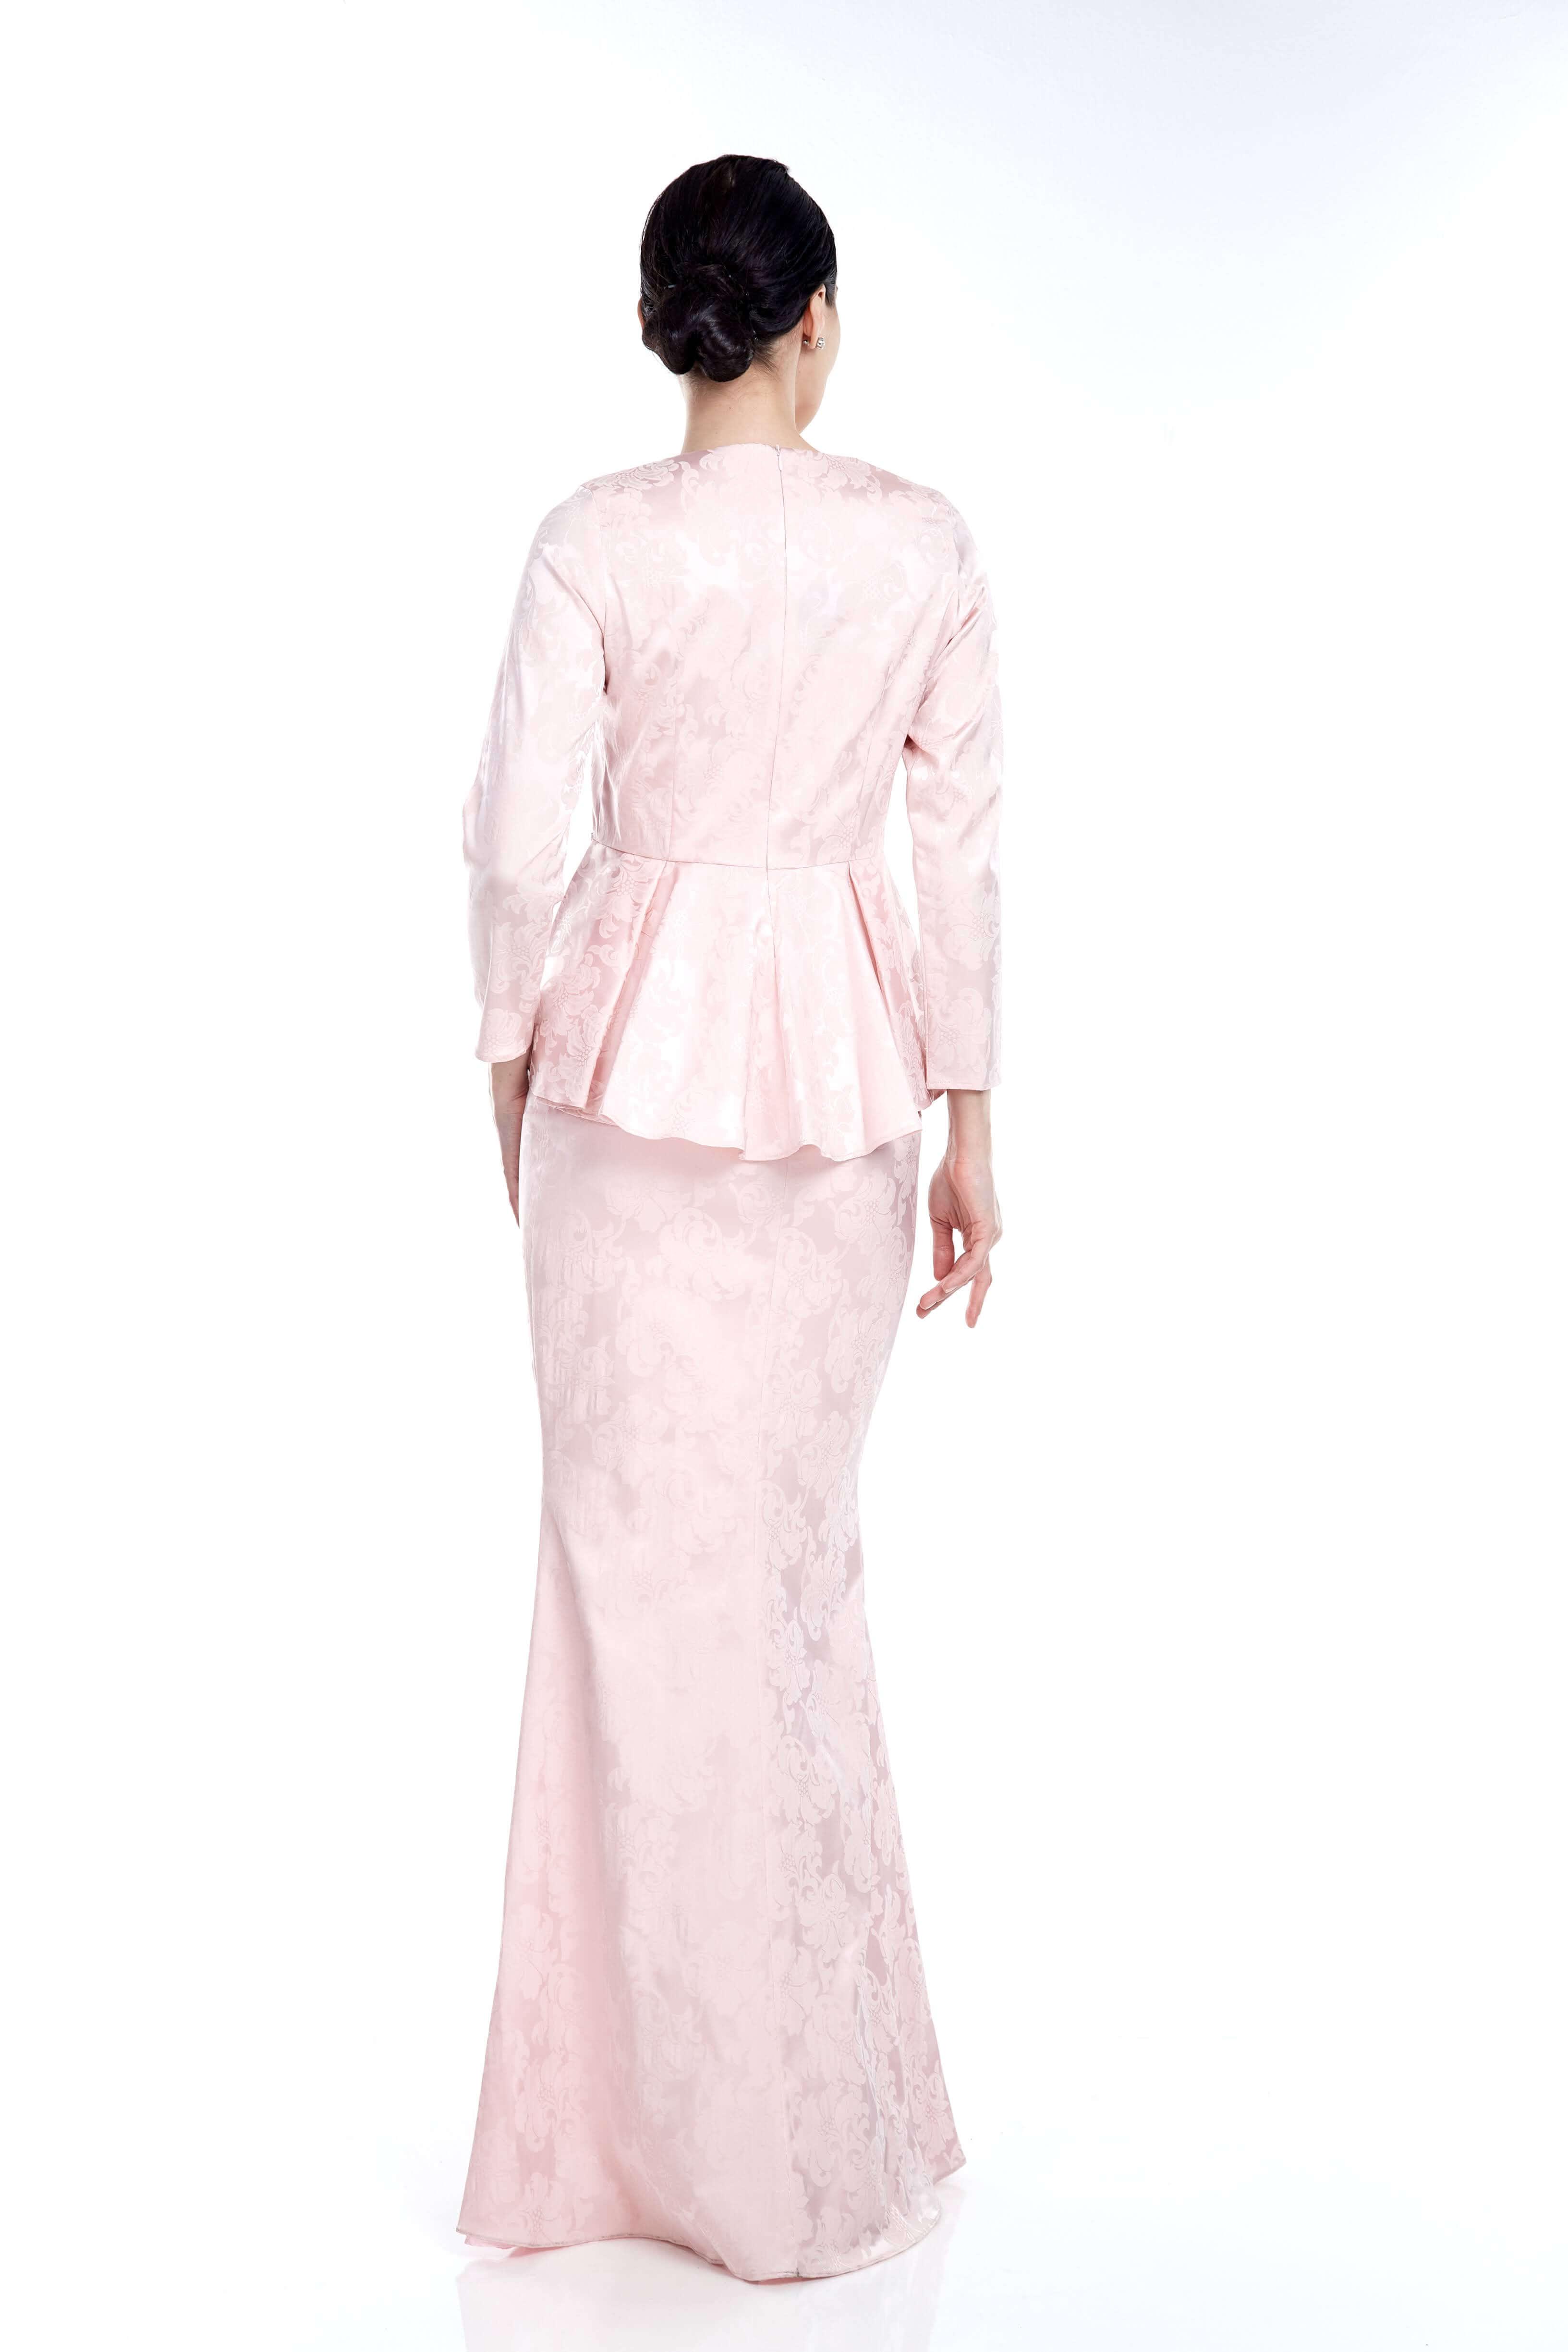 Pink Peplum Top With Embellishment (6)